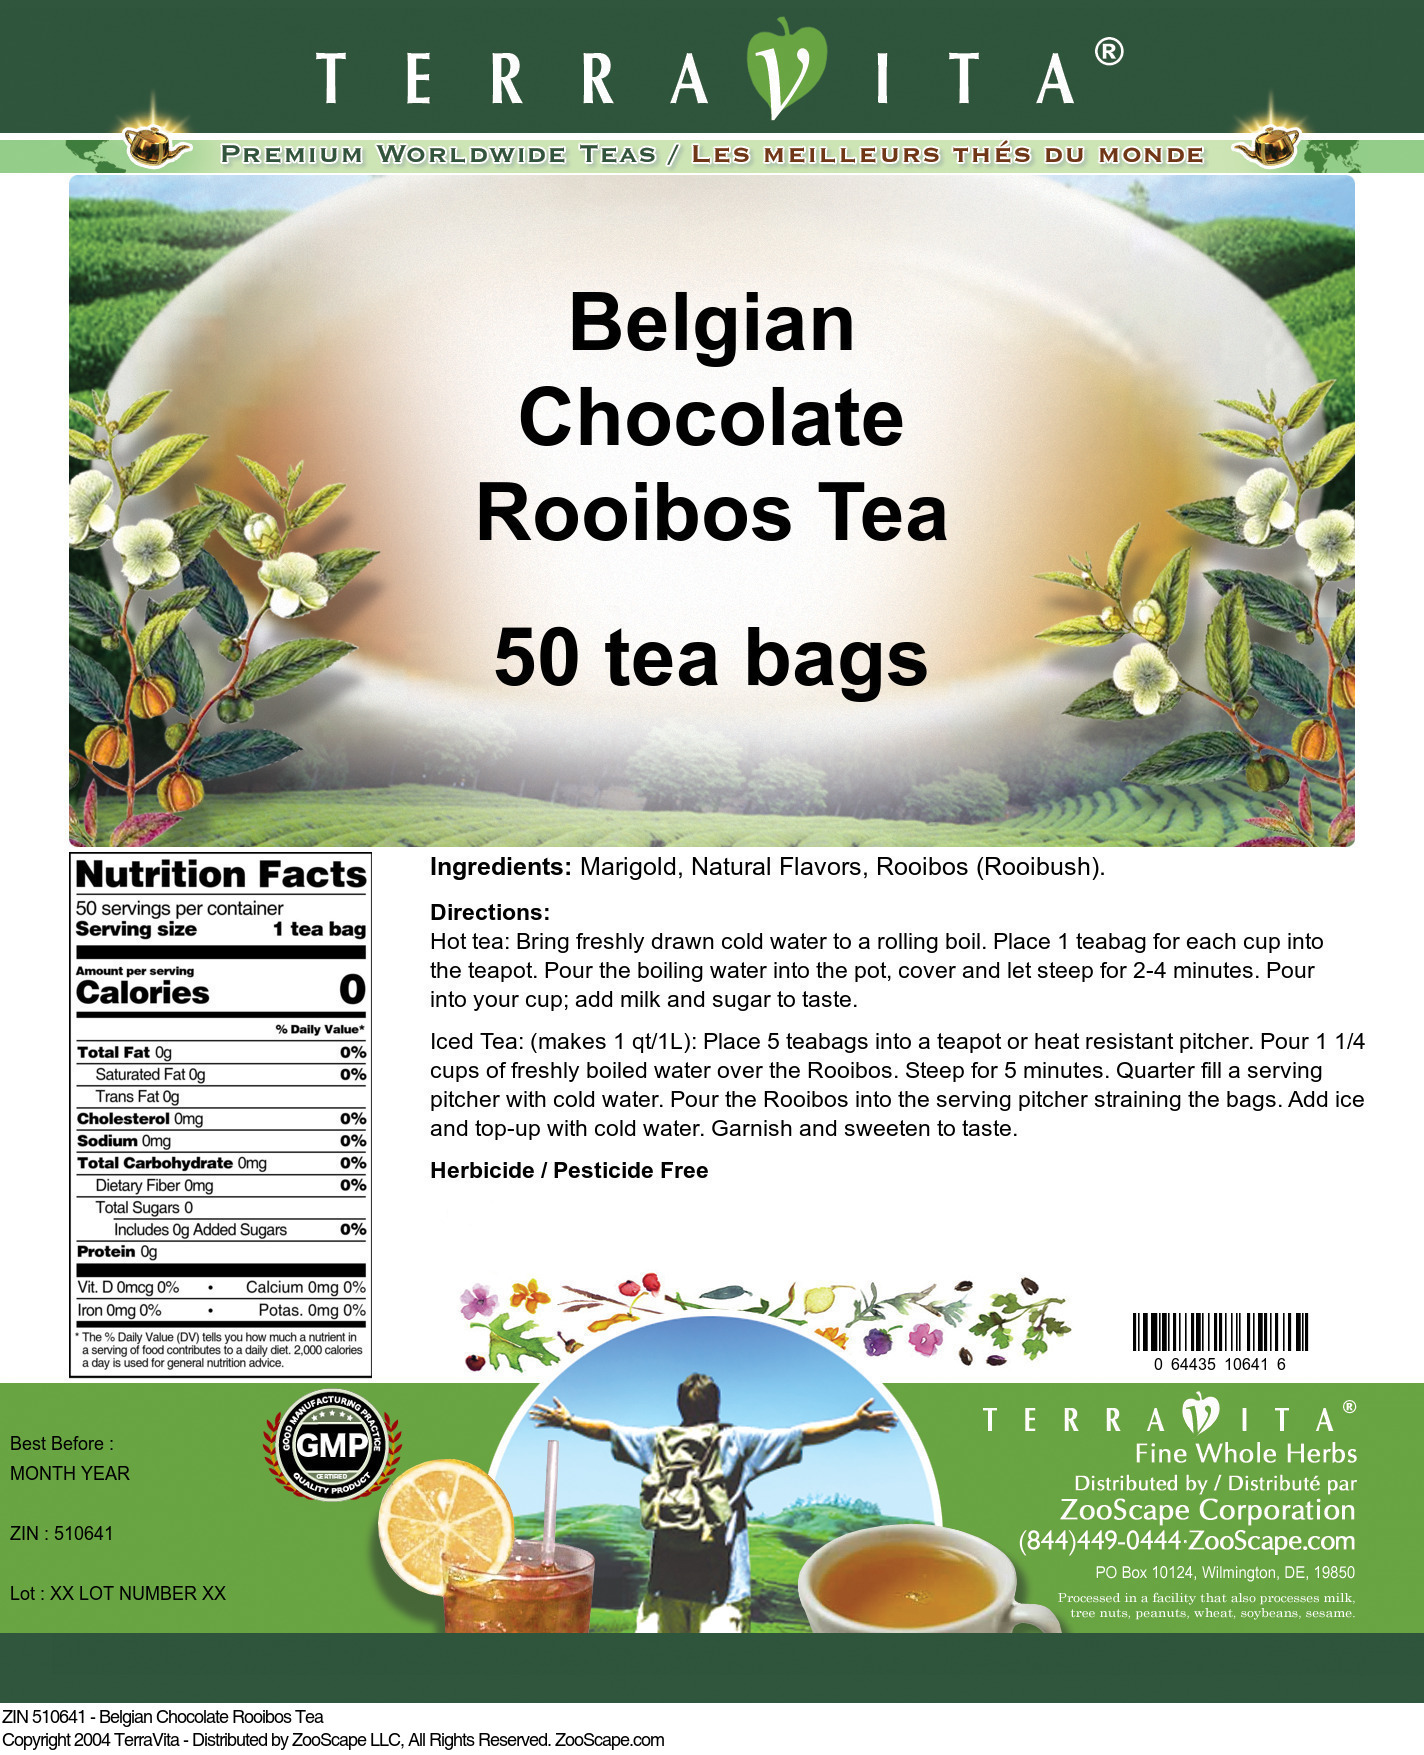 Belgian Chocolate Rooibos Tea - Label